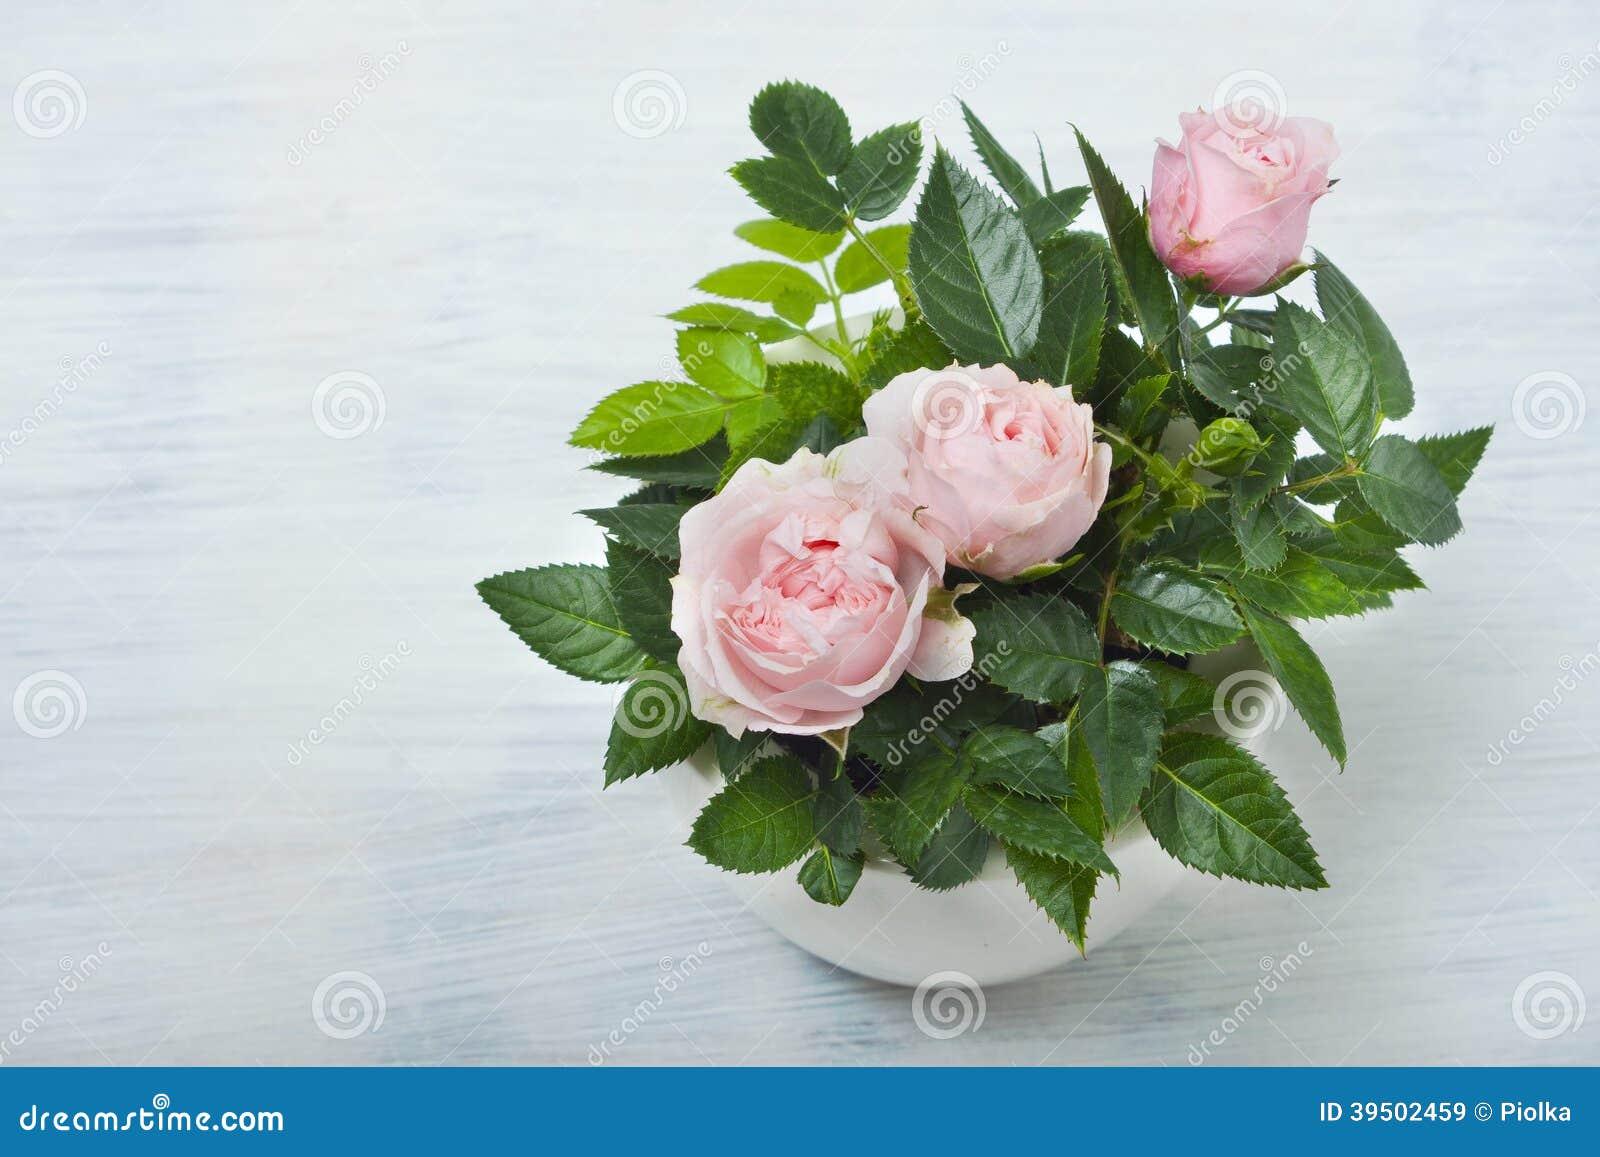 Beautiful little roses